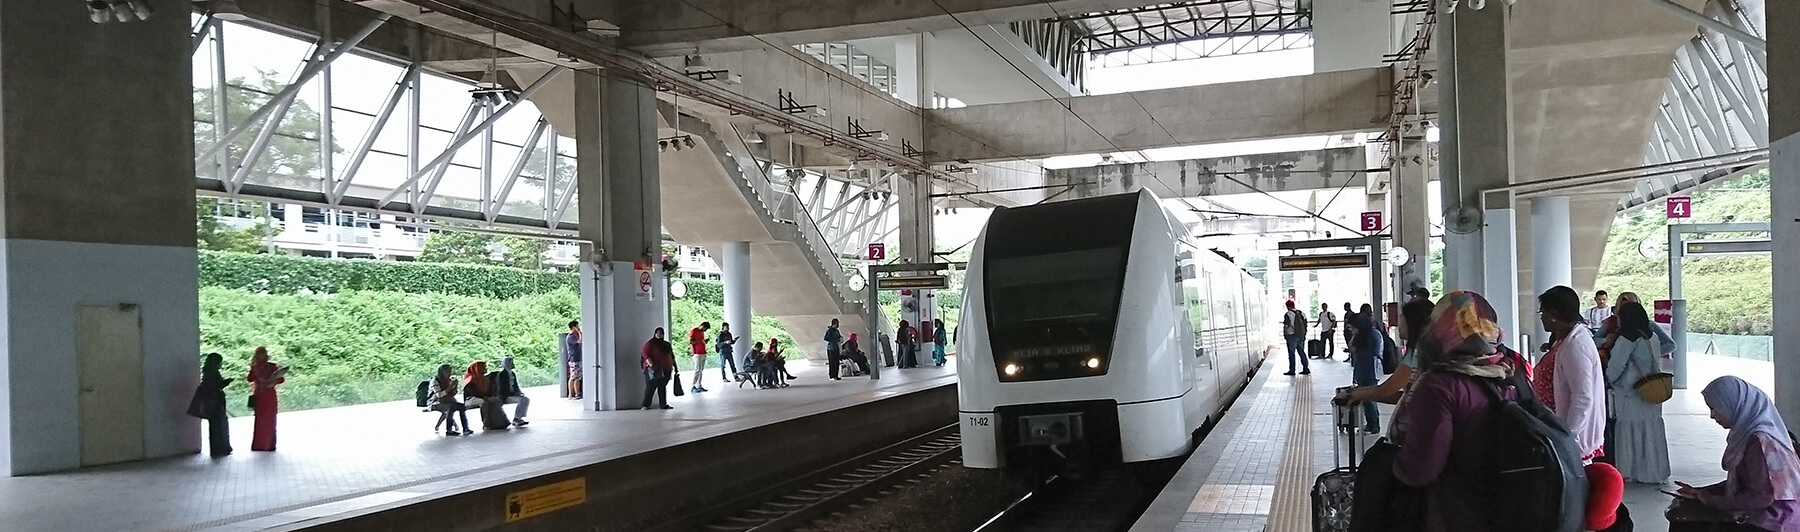 Putrajaya-Sentral, Malaysia